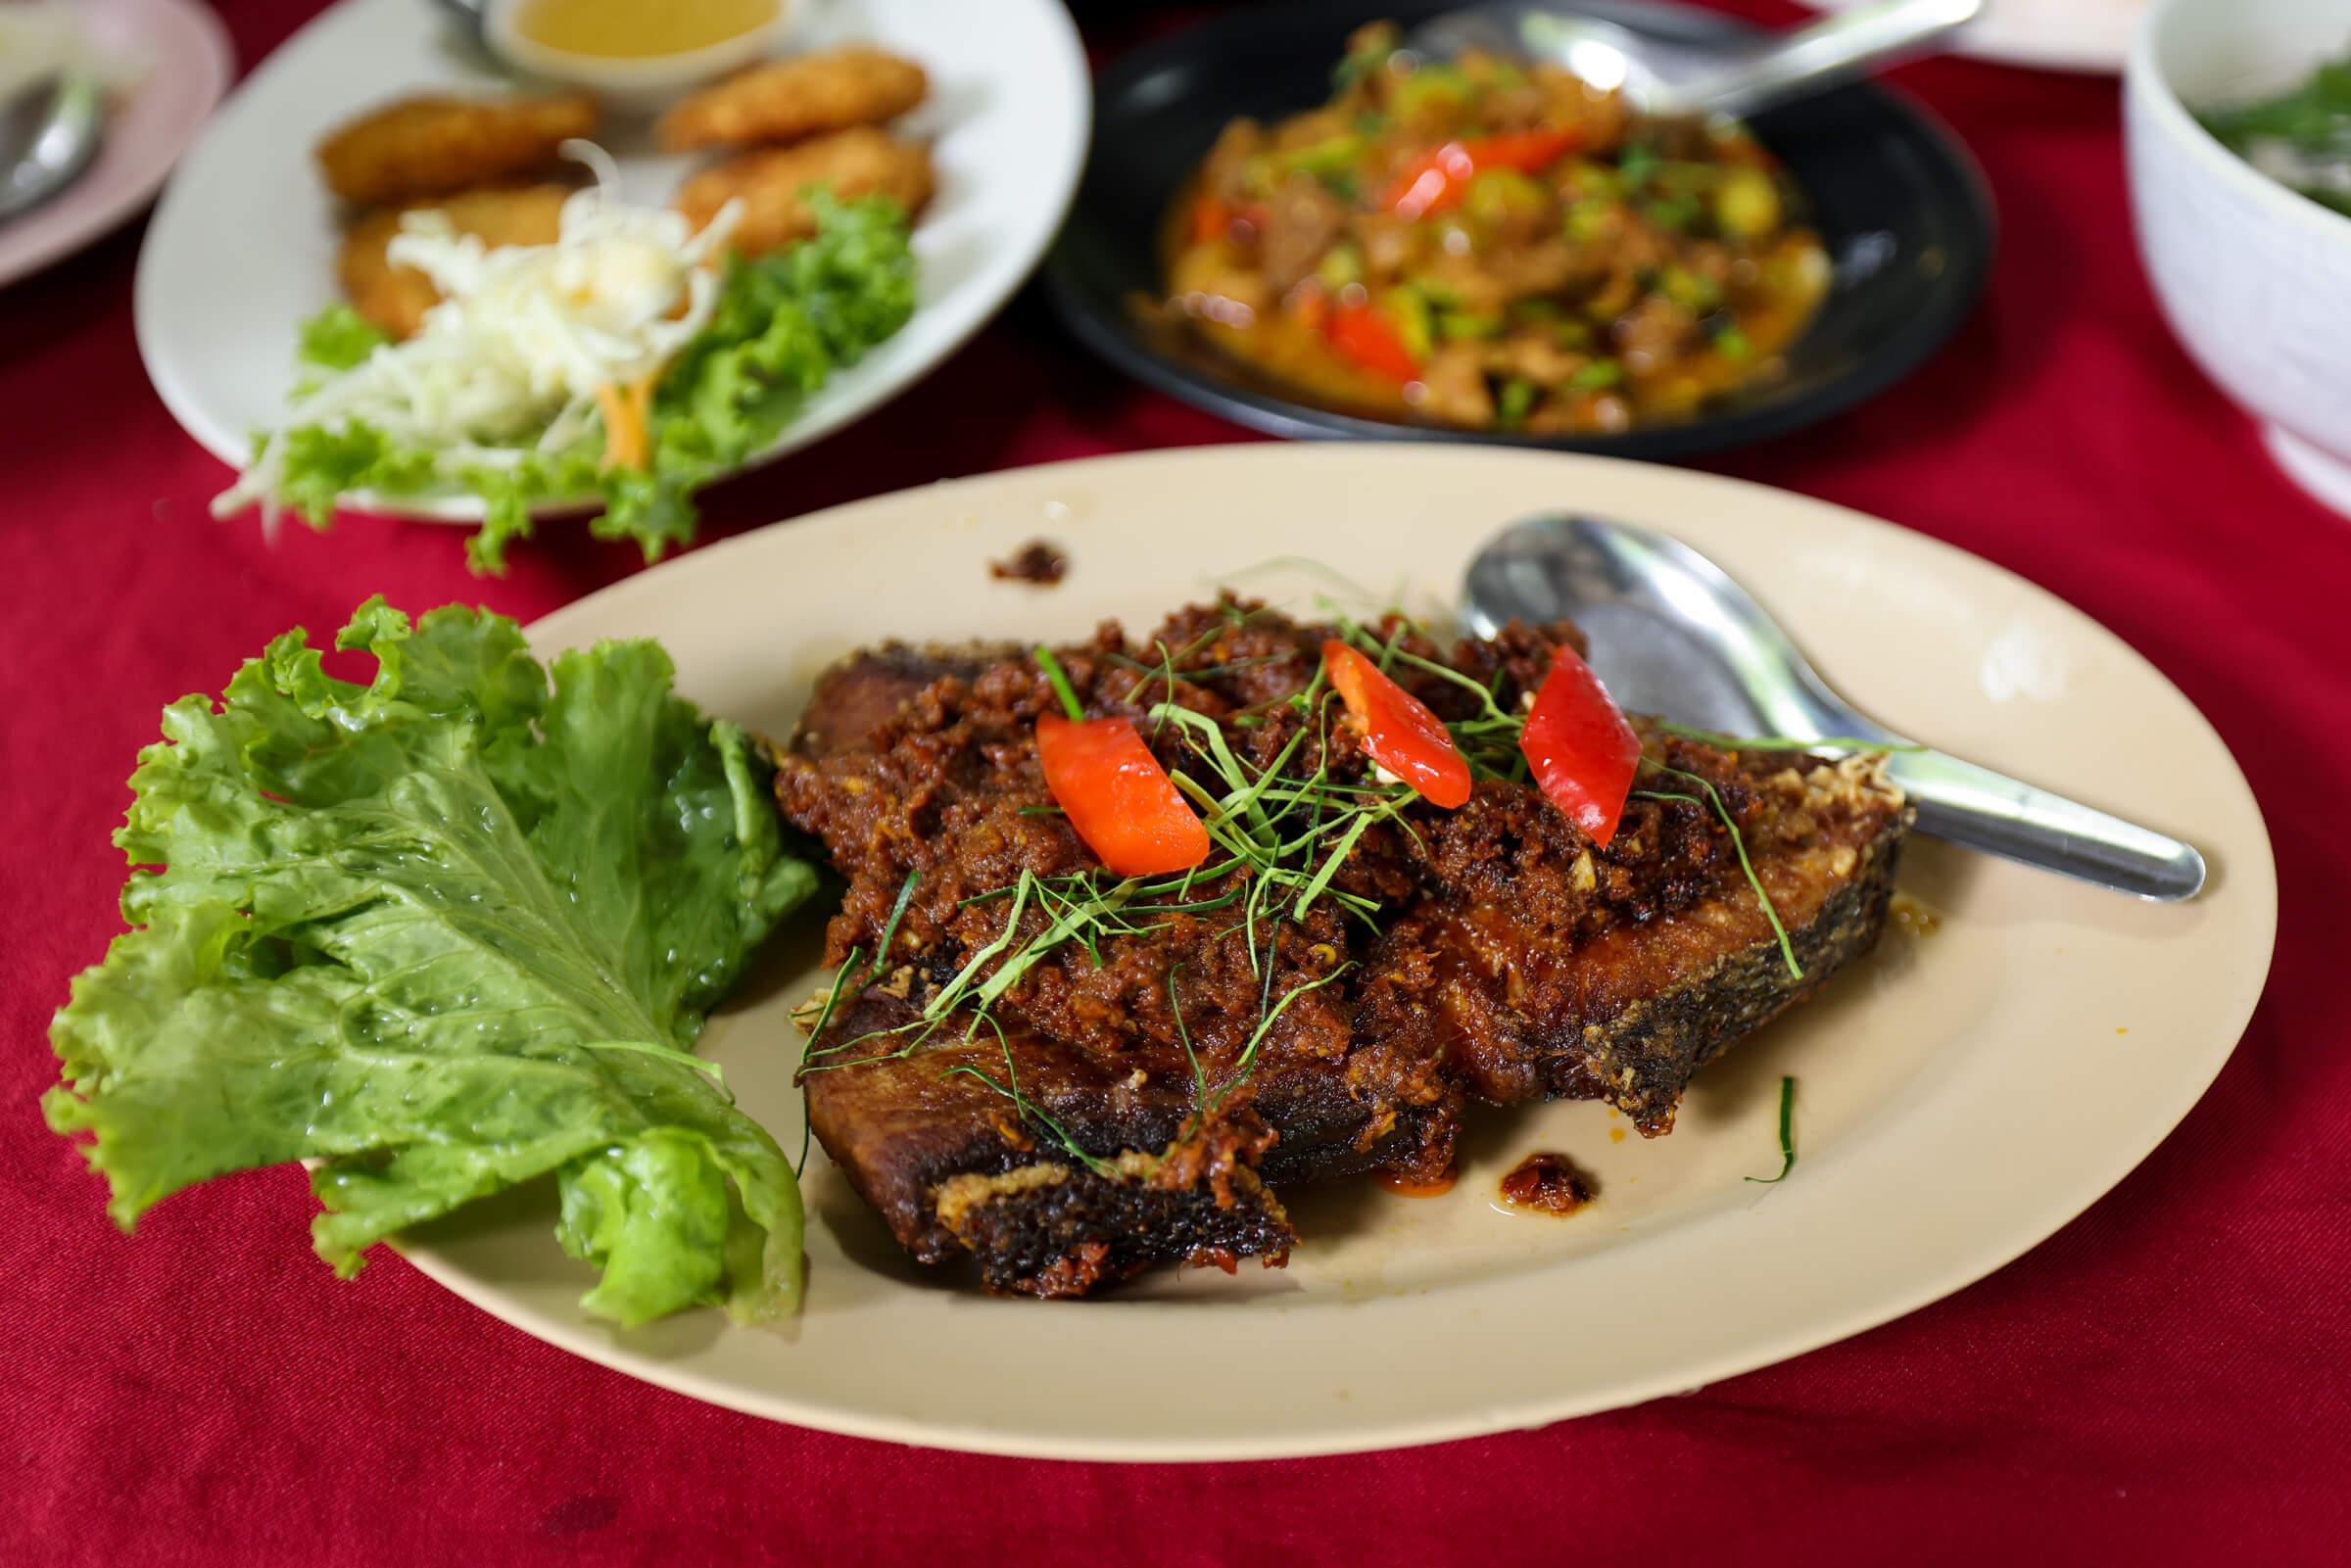 Krua Pailin (ครัวไพลินอาหารภูเก็ต)